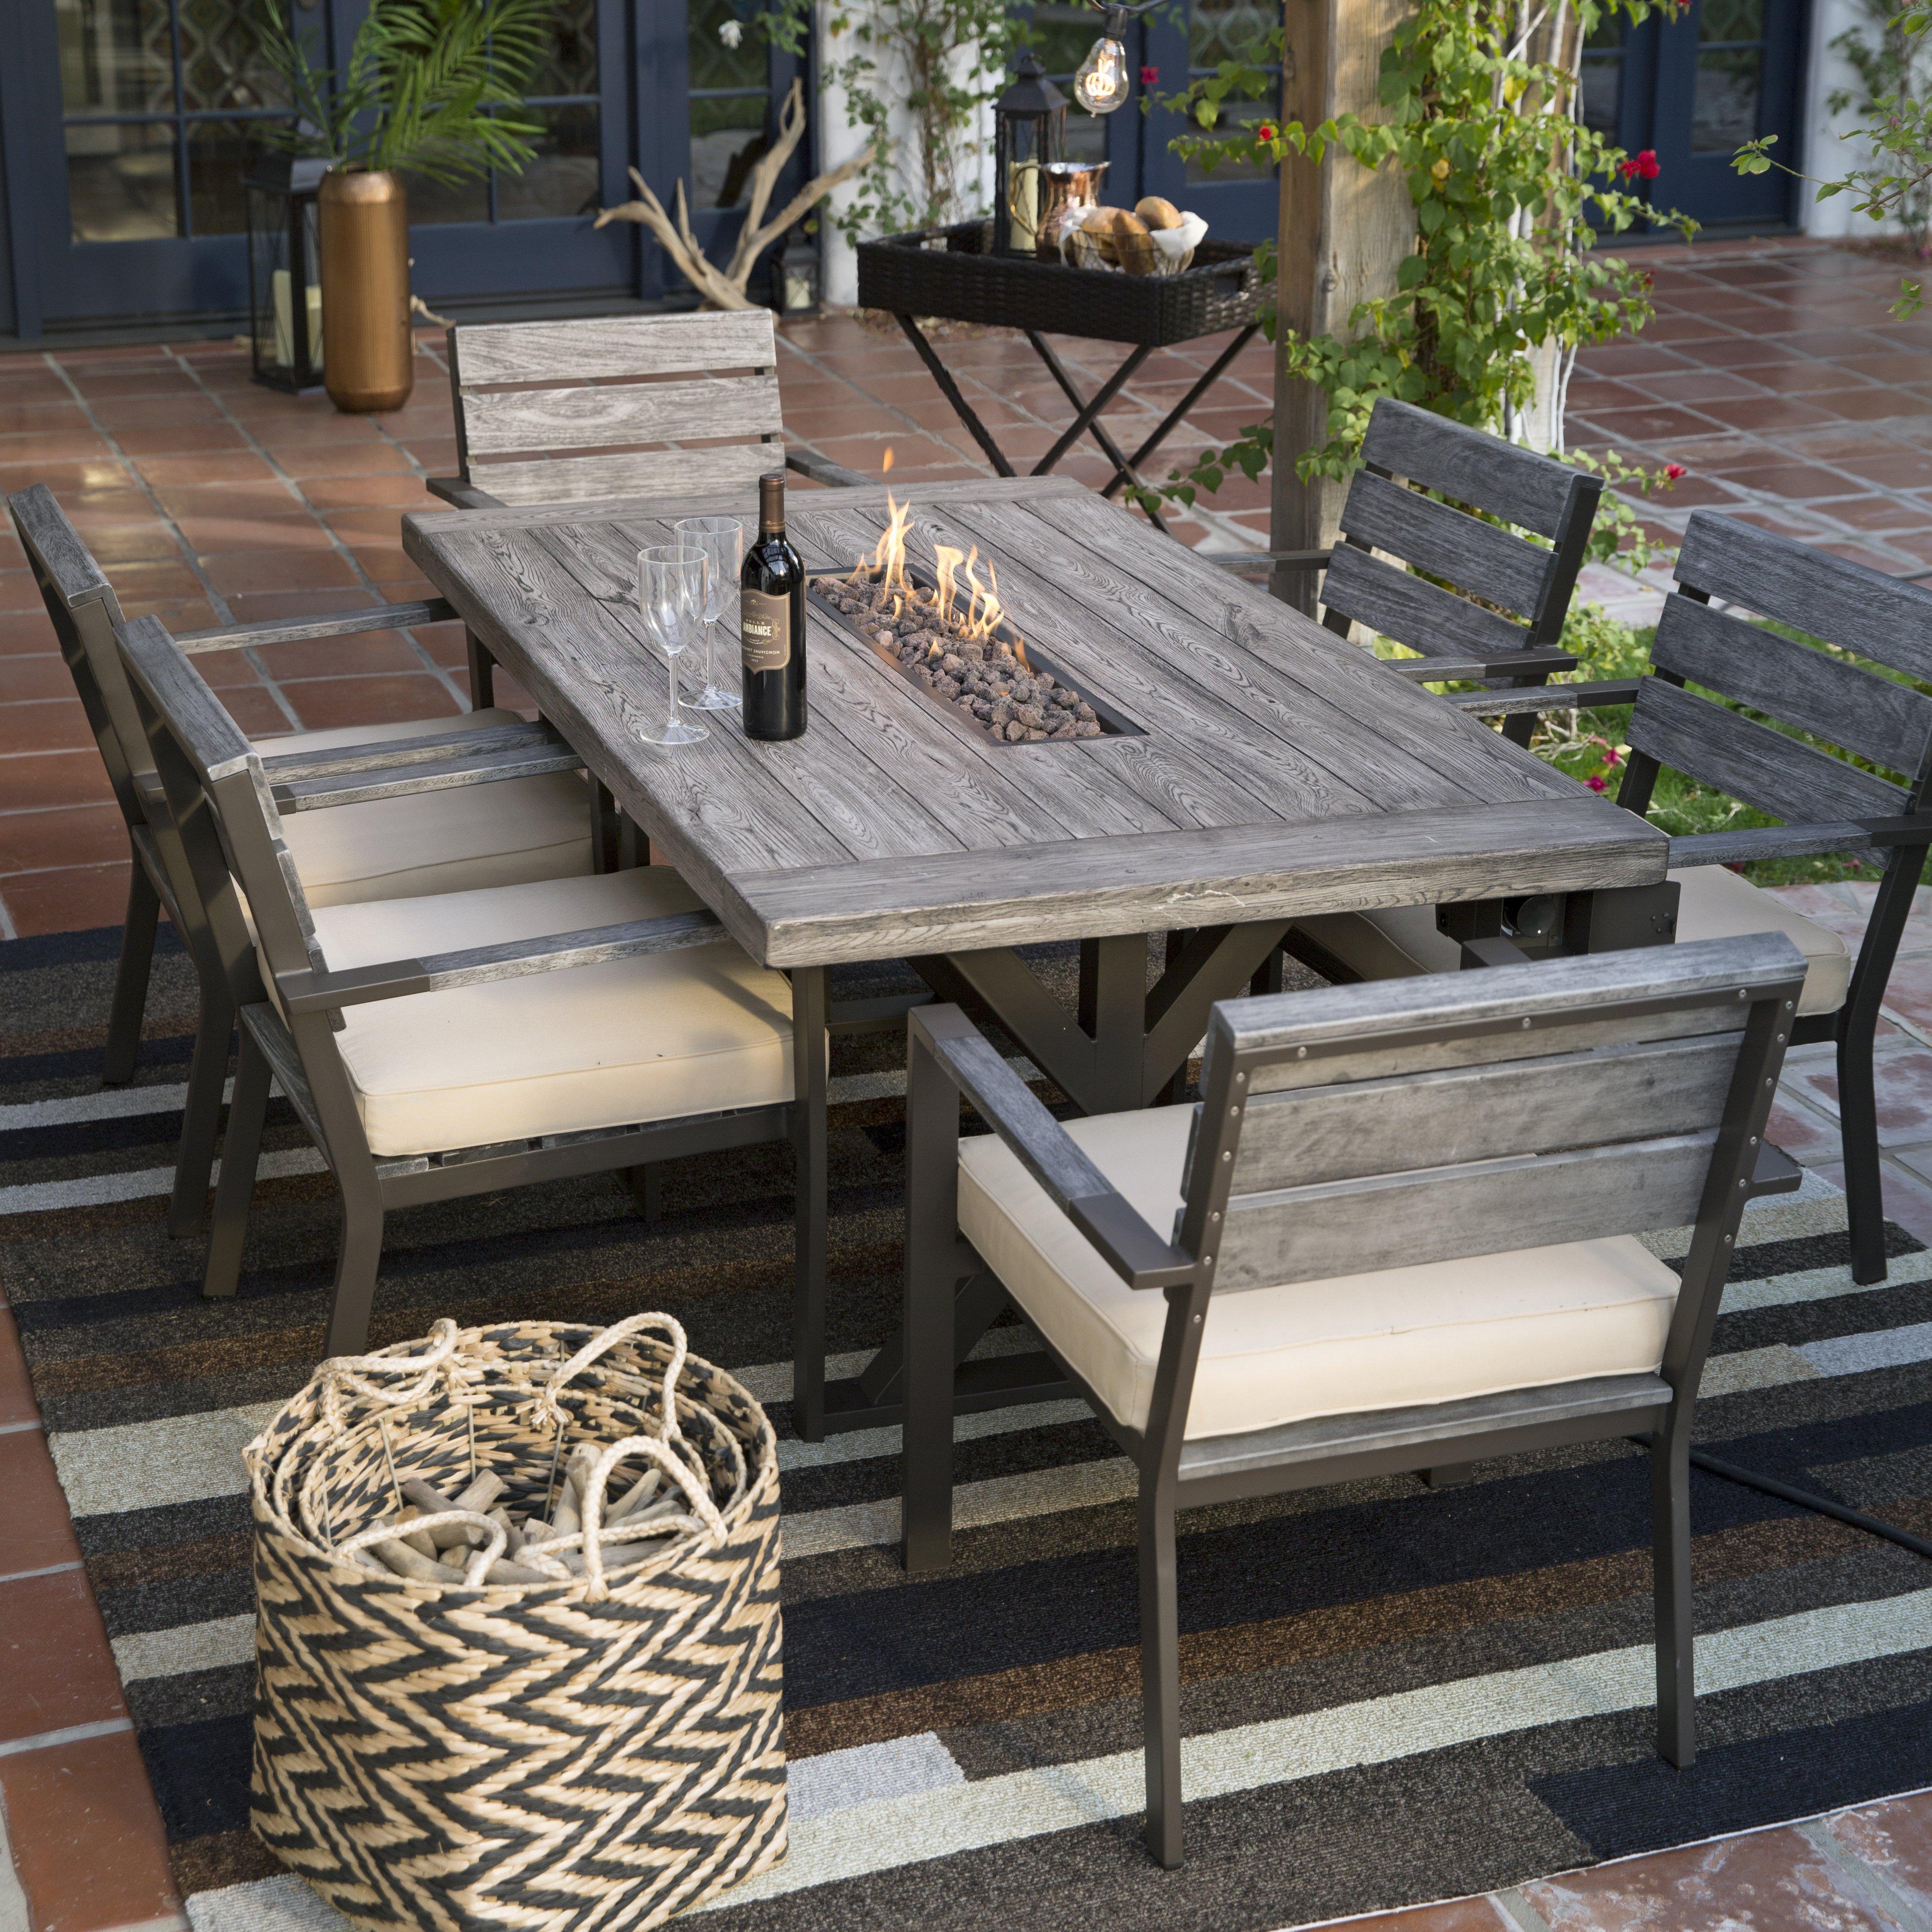 patio dining sets fire table patio set new belham living silba 7 piece envirostone fire pit BSAPZDX